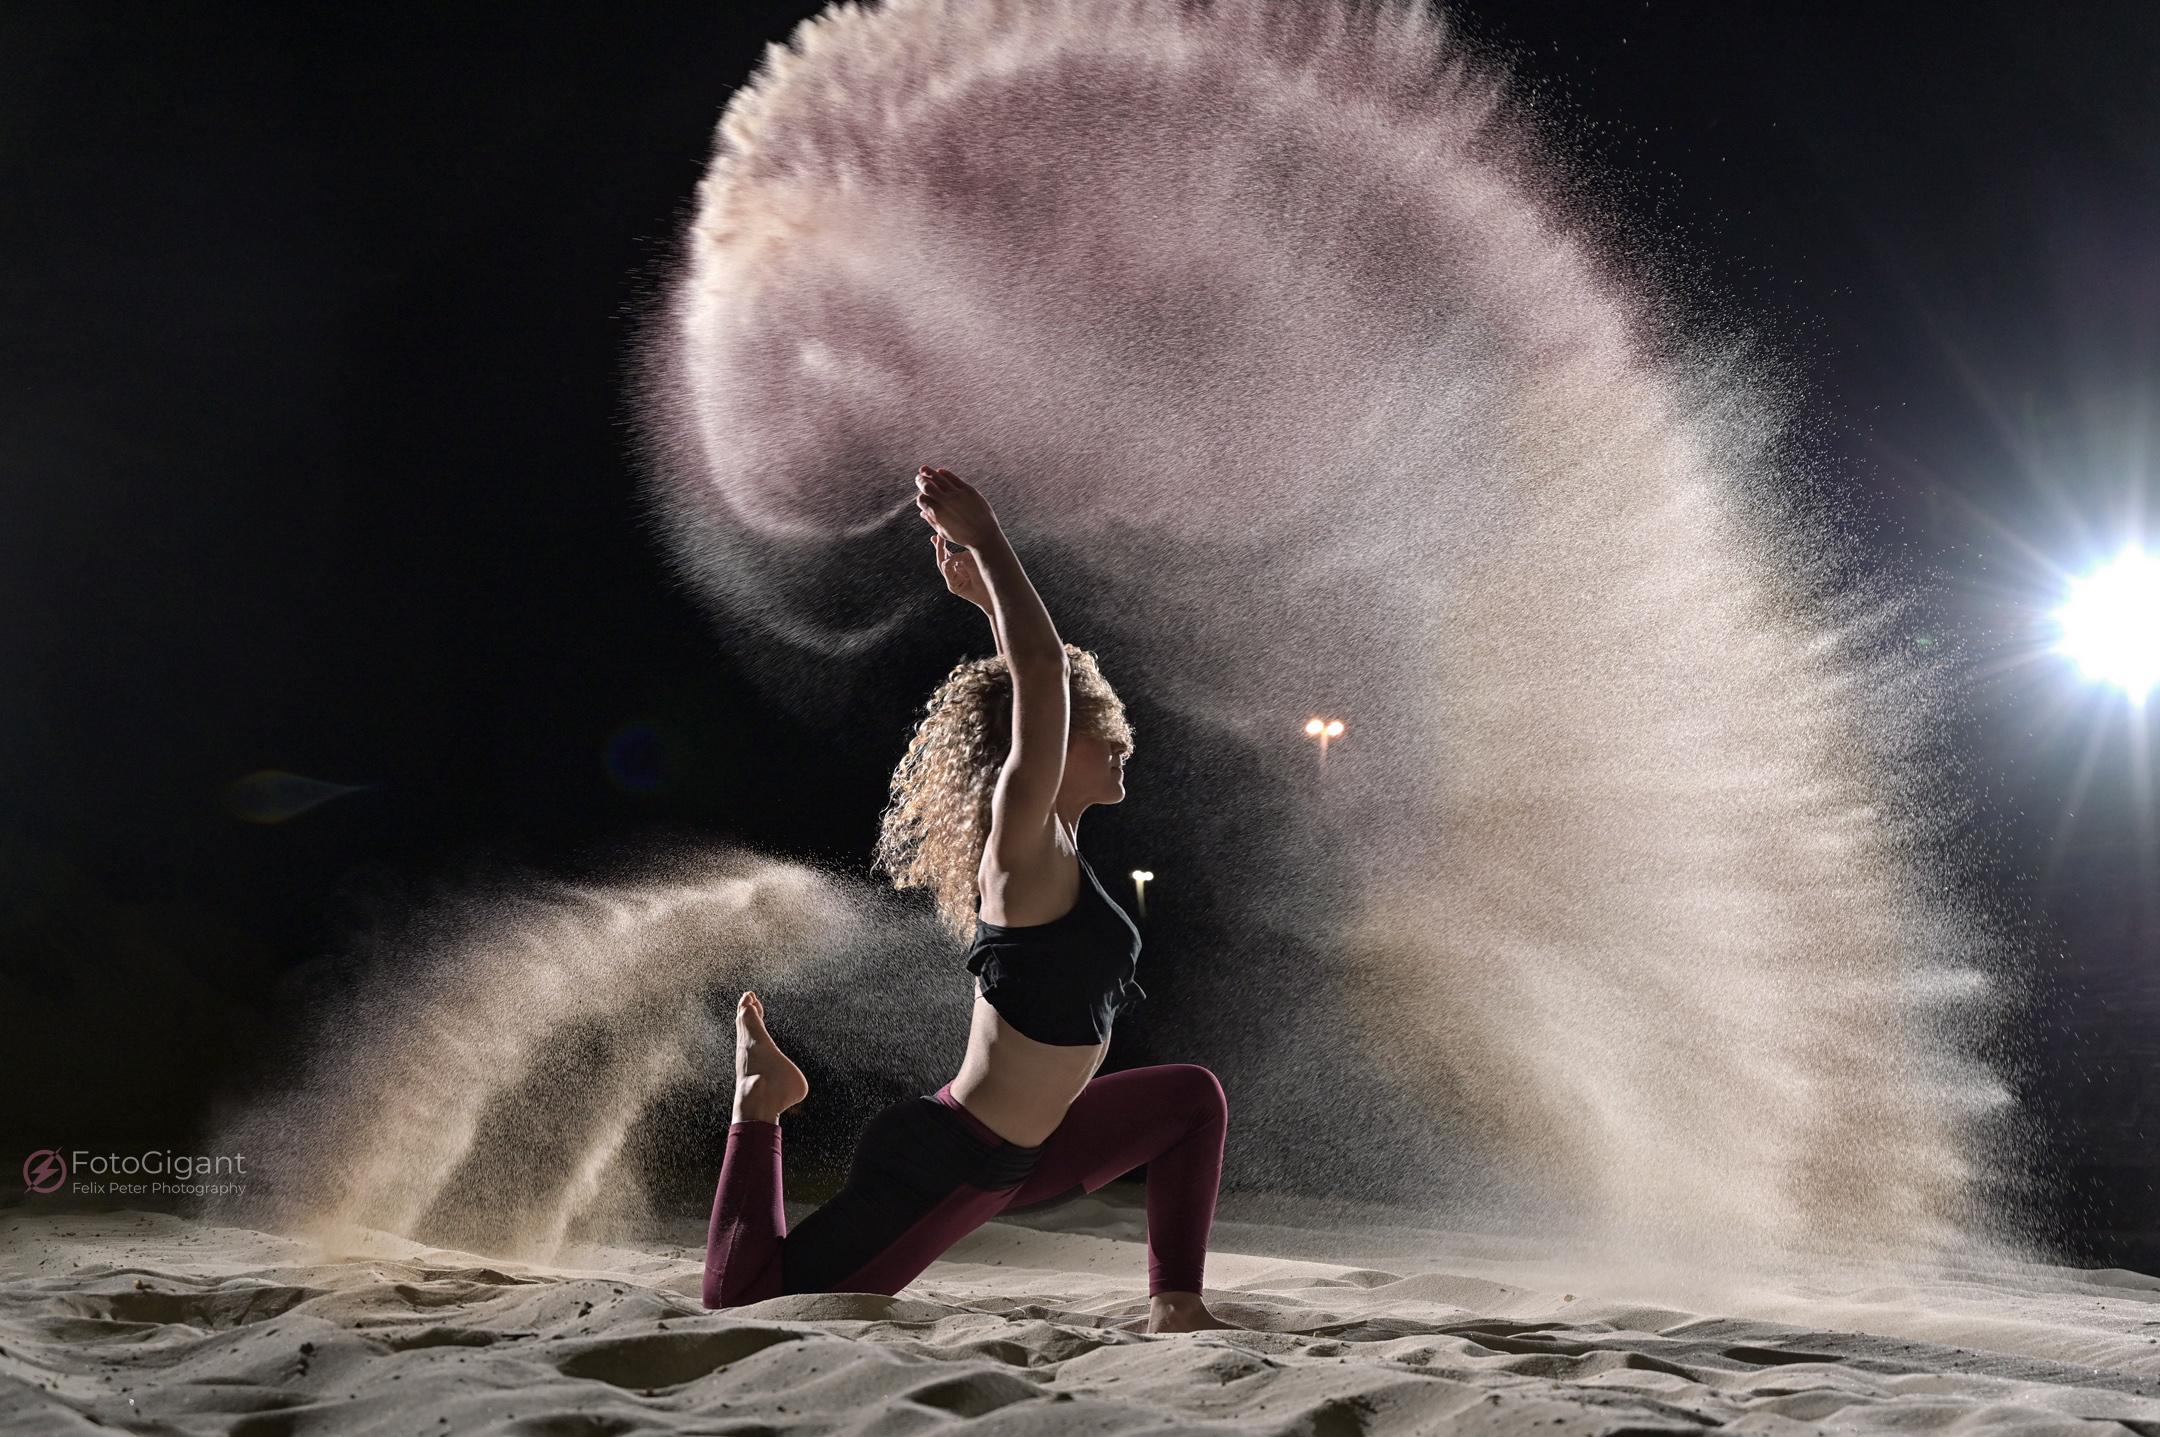 Sand-Flour-Mehl-Shooting_1.jpg